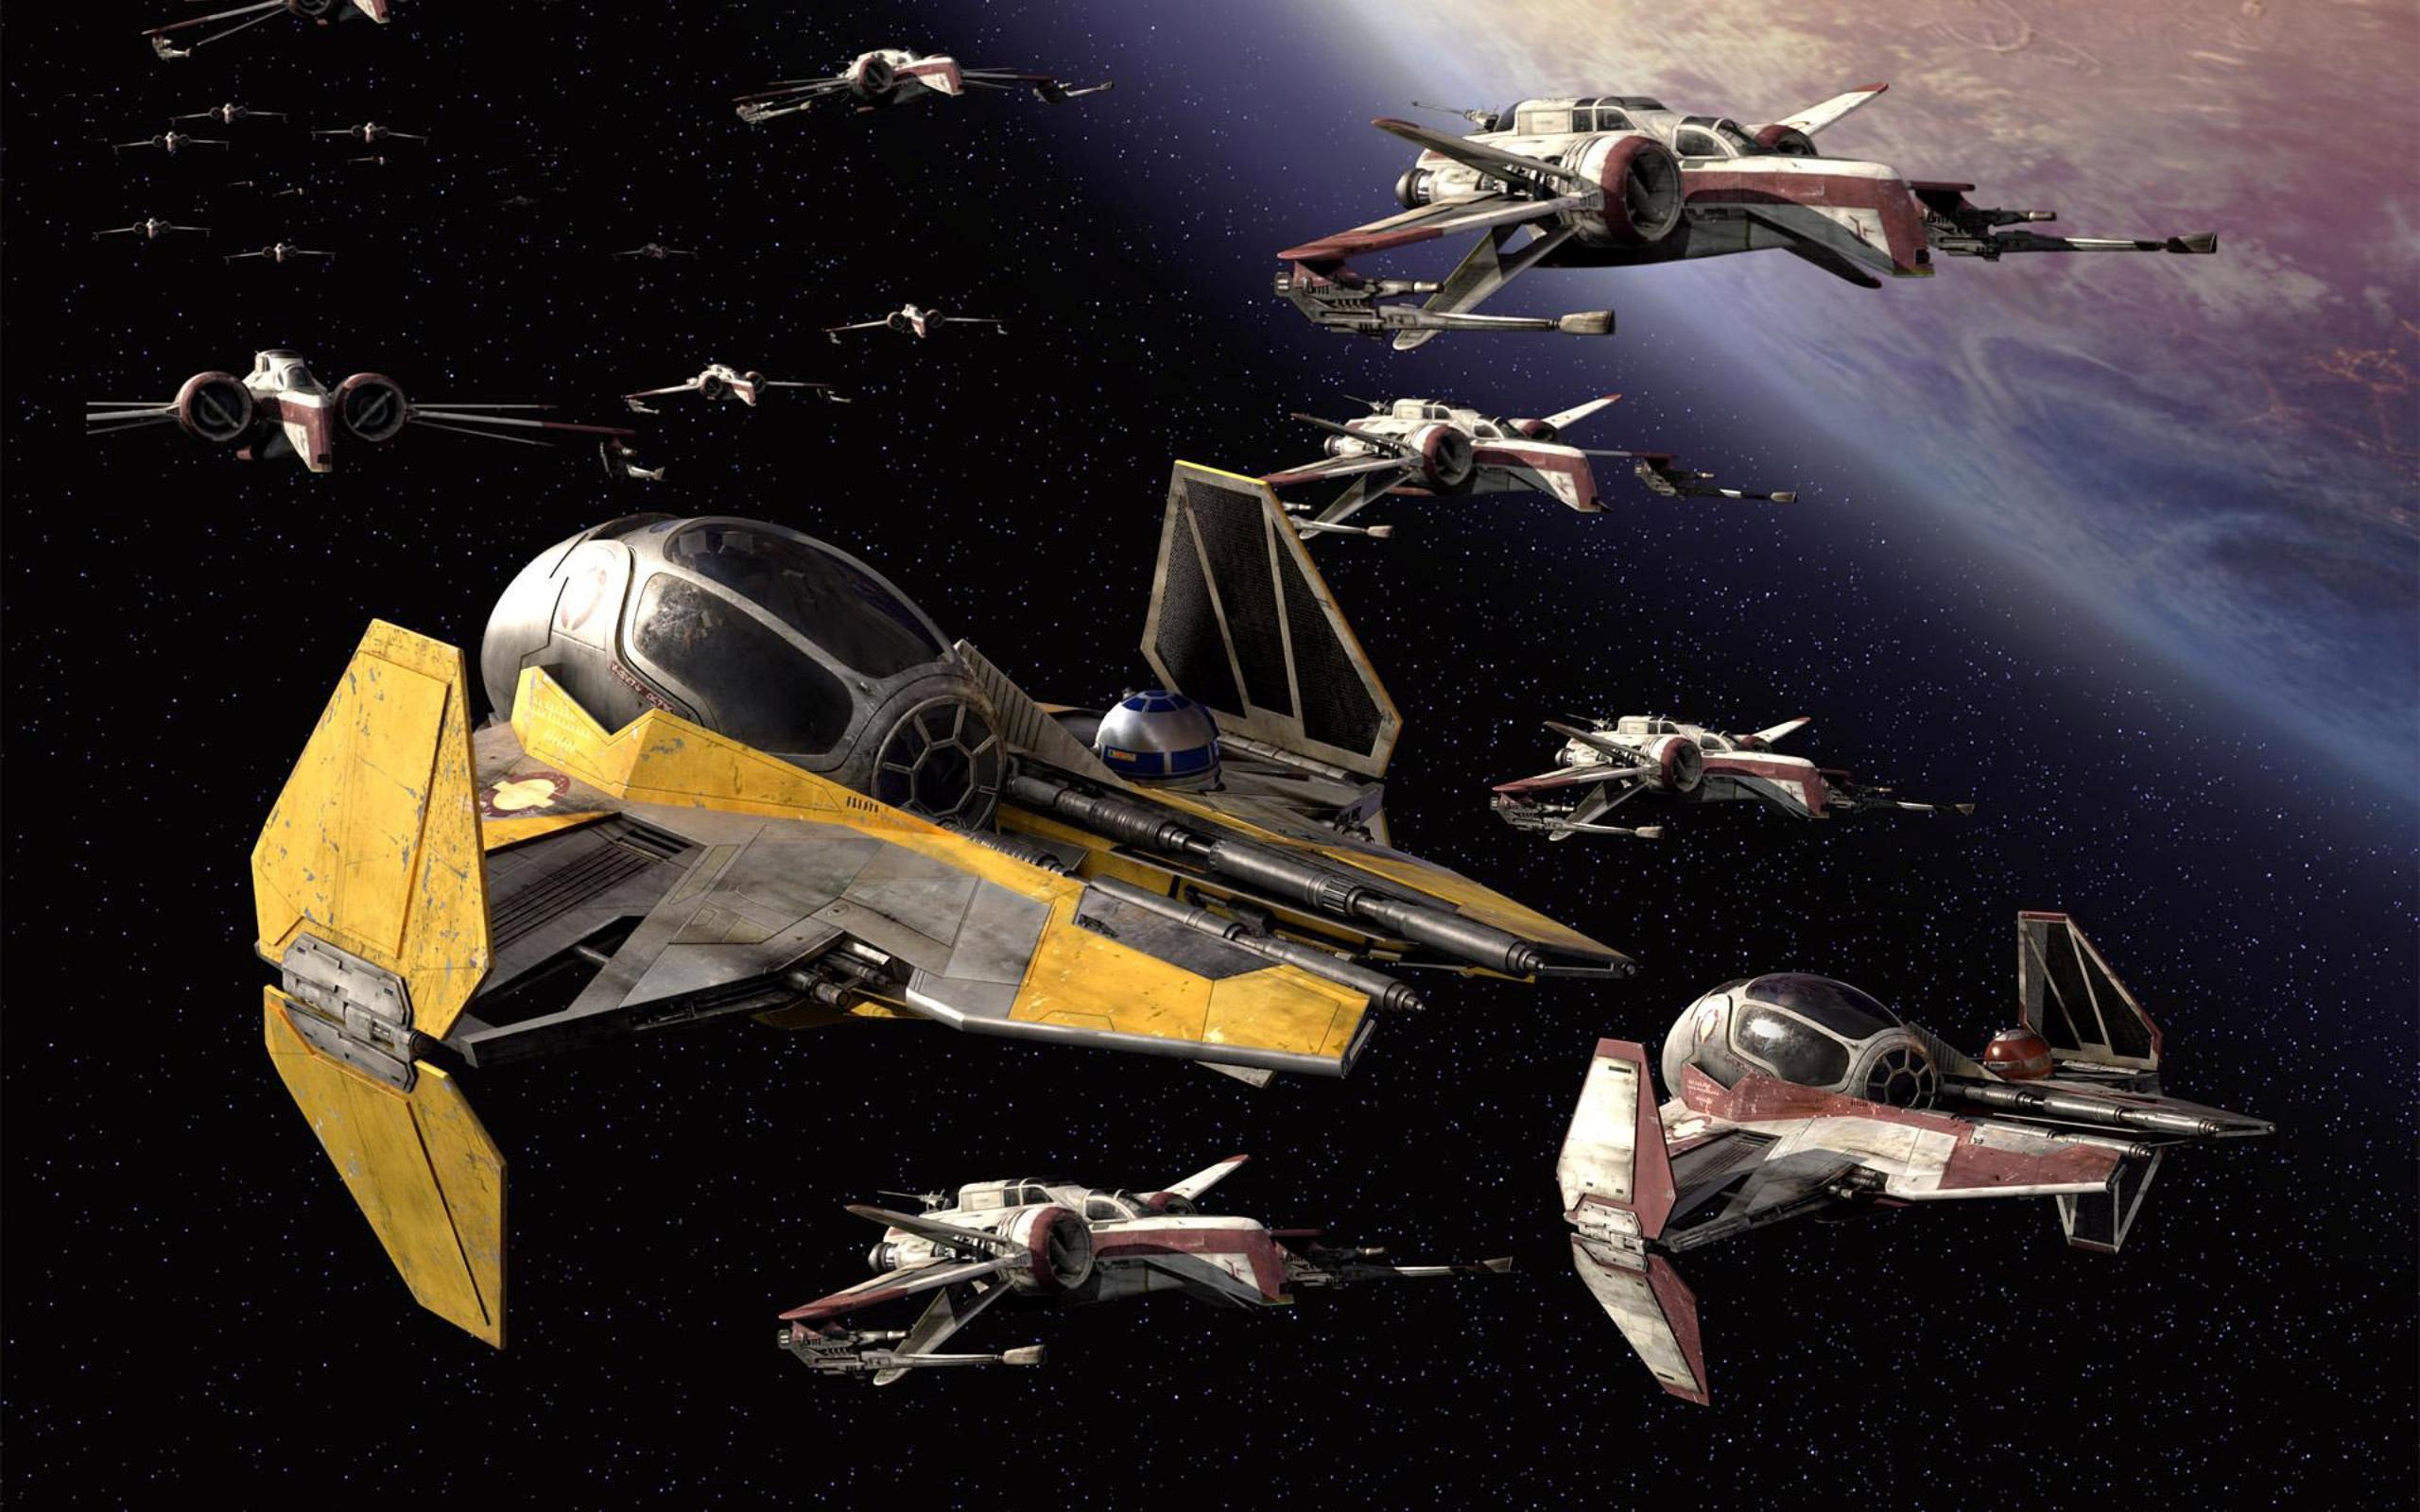 Star Wars Wallpapers HD widescreen 2560 x 1600 2560x1600